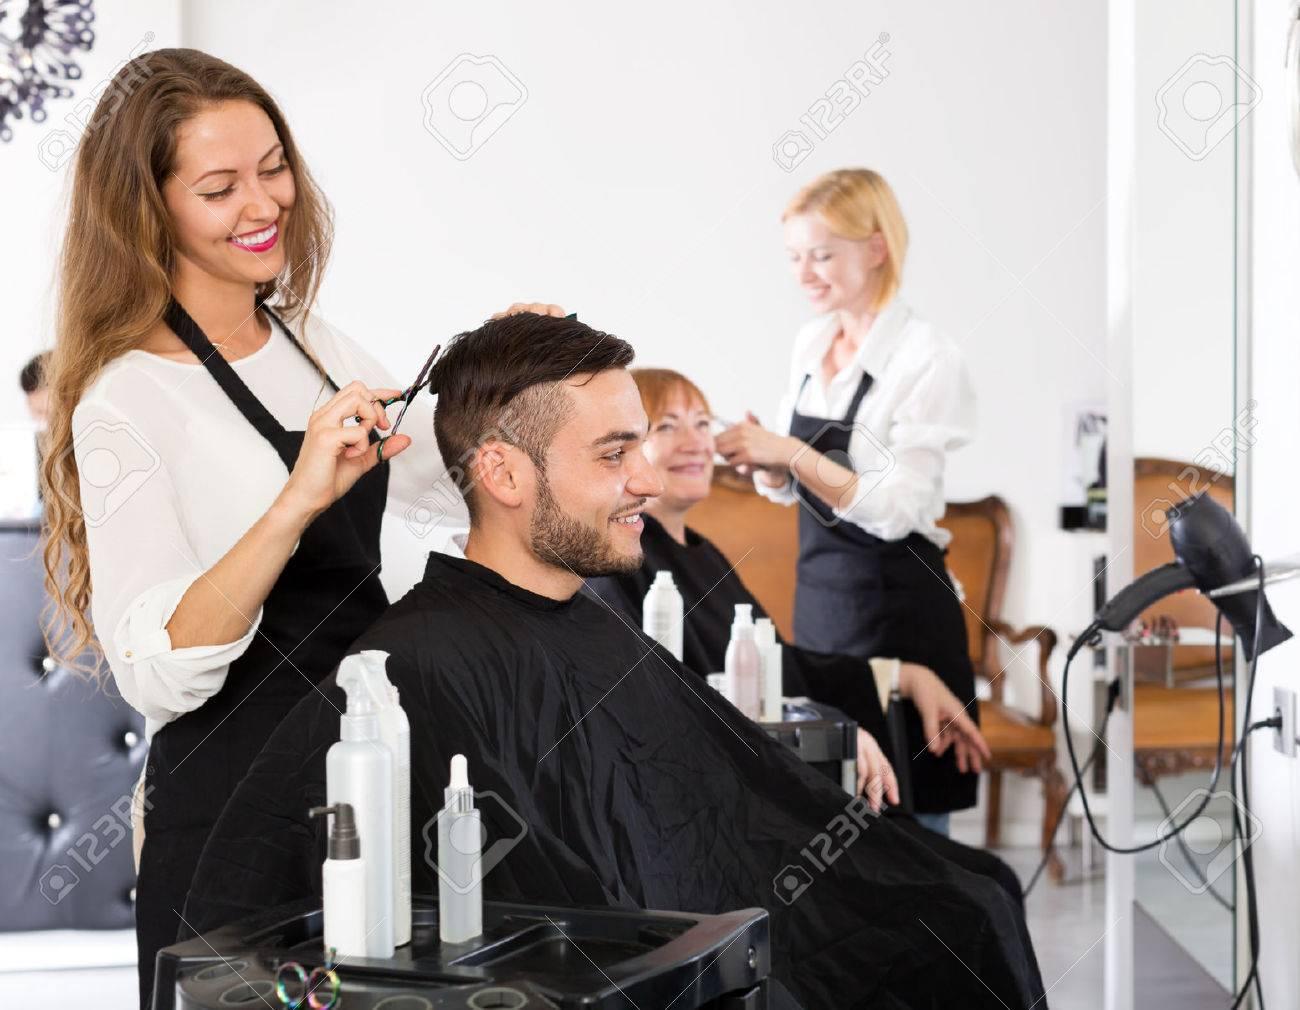 Cheerful young guy cuts hair at the hair salon Stock Photo - 42931302